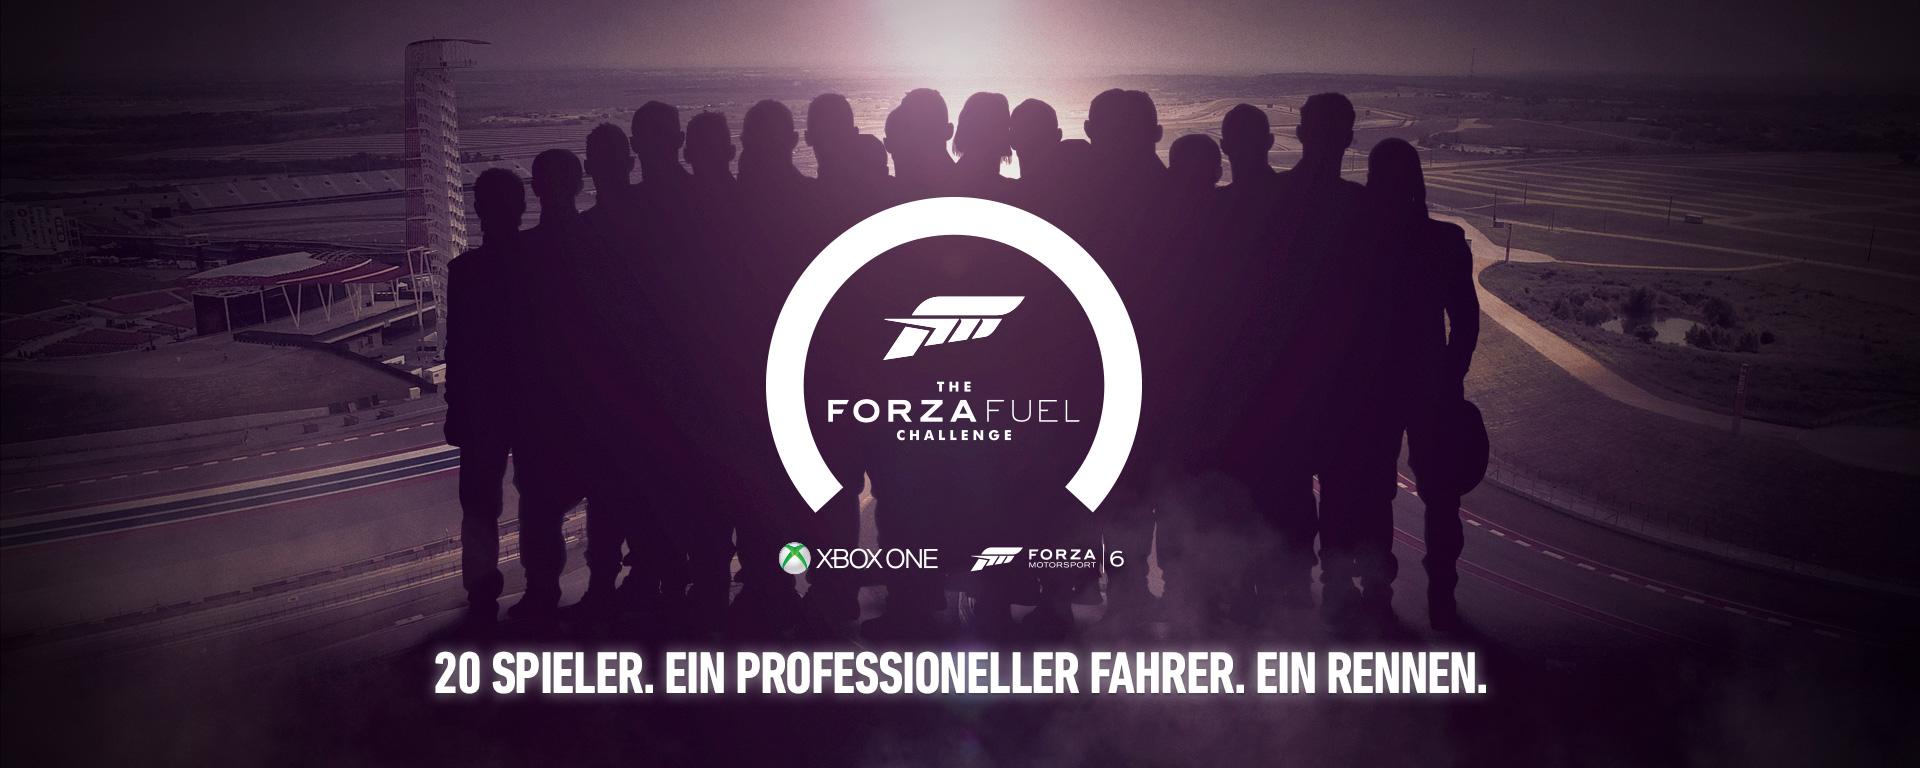 Forza Fuel | Forza Motorsport 6 | Xbox One